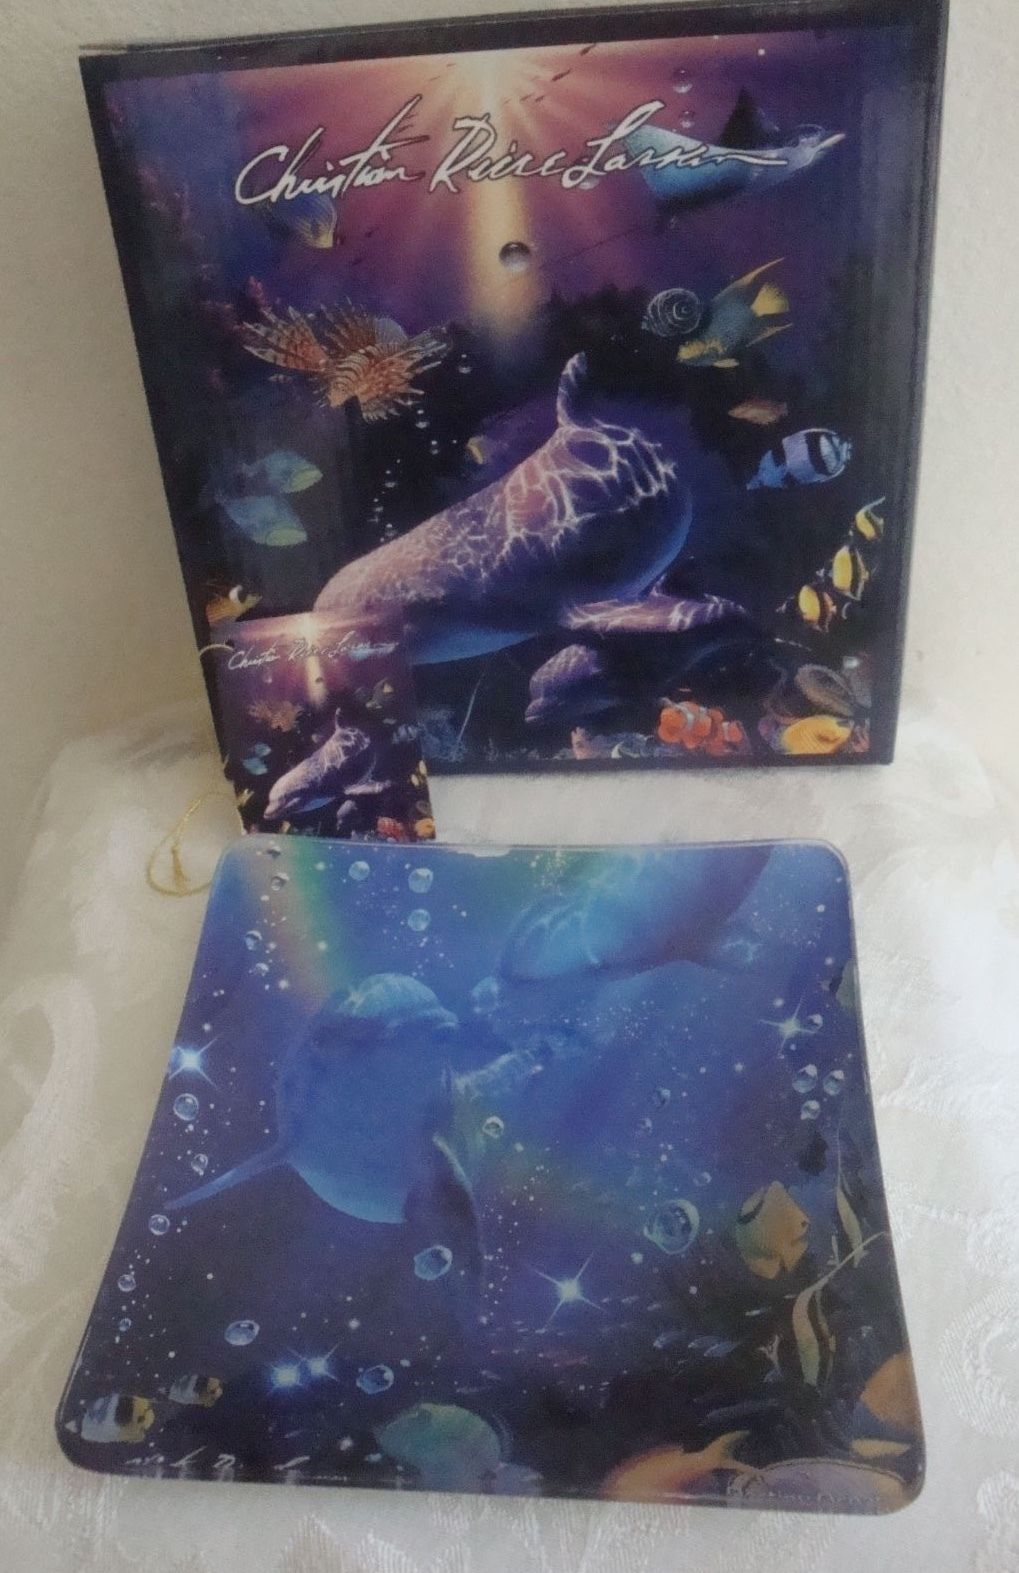 Sealife Dolphins Fish Decorative Plate Glass Dish Christian Riese Lassen New